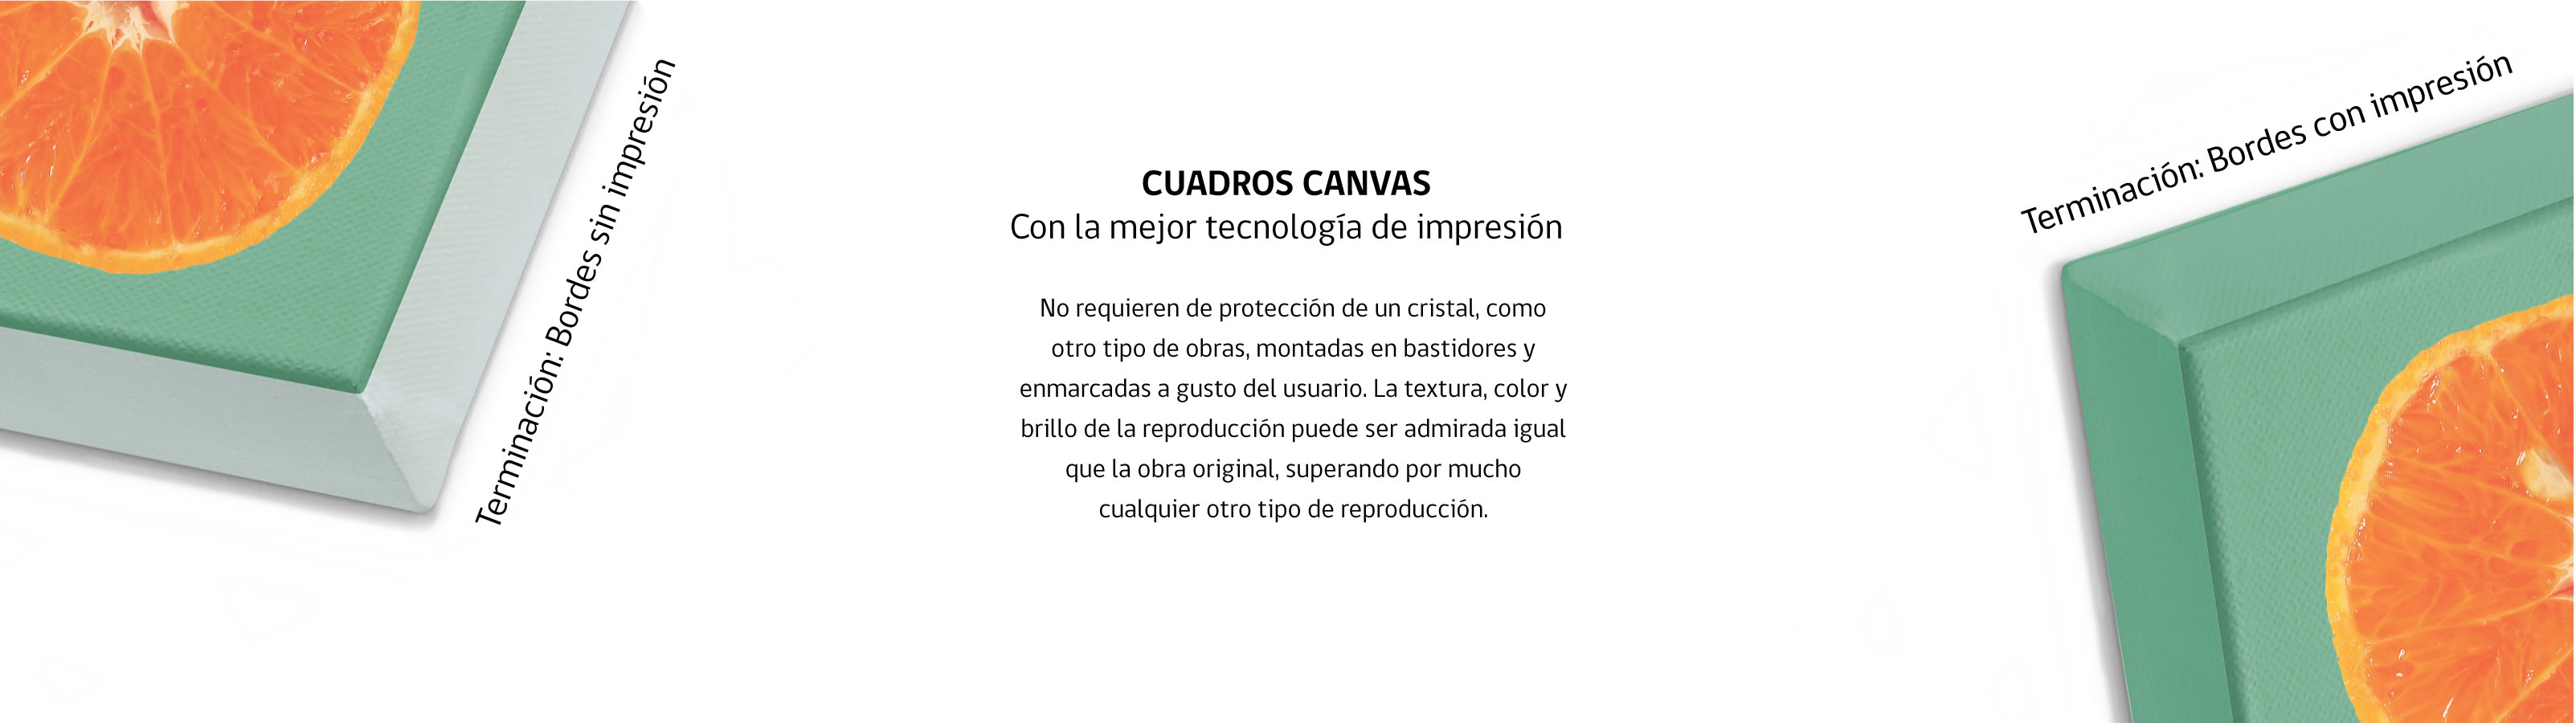 canvas 004